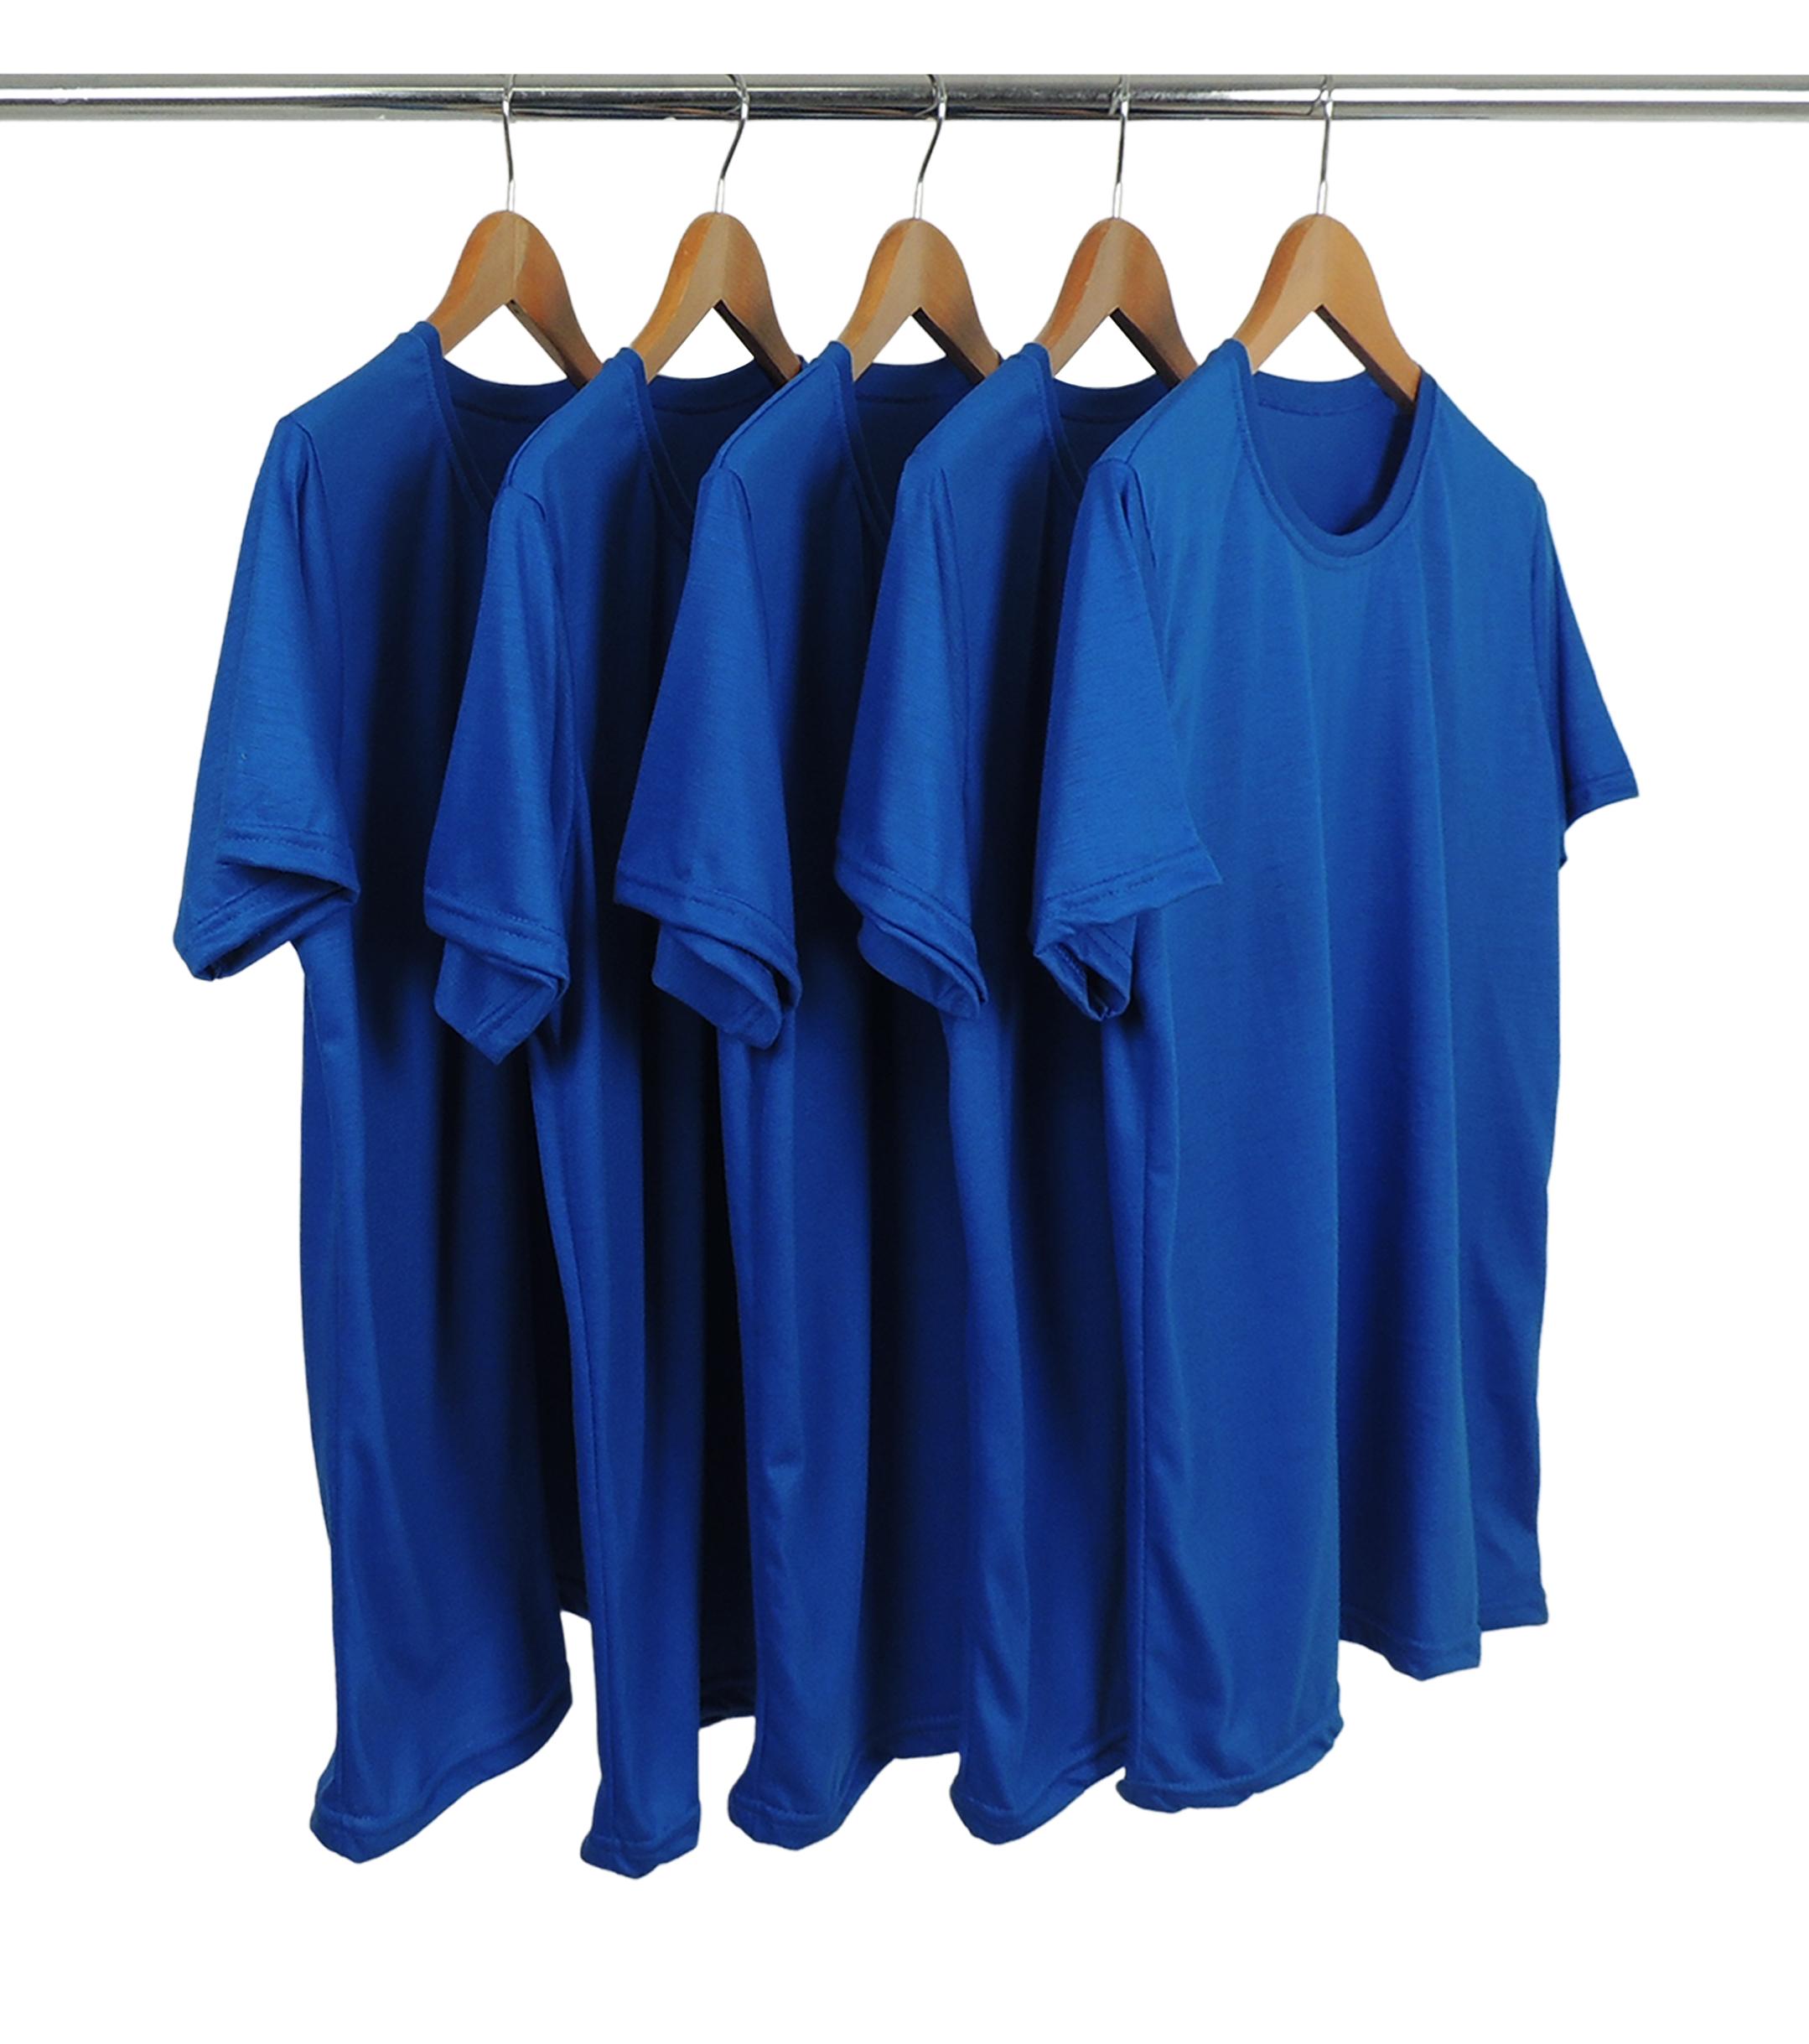 KIT 5 Camisetas de Poliéster/Sublimática Azul Royal